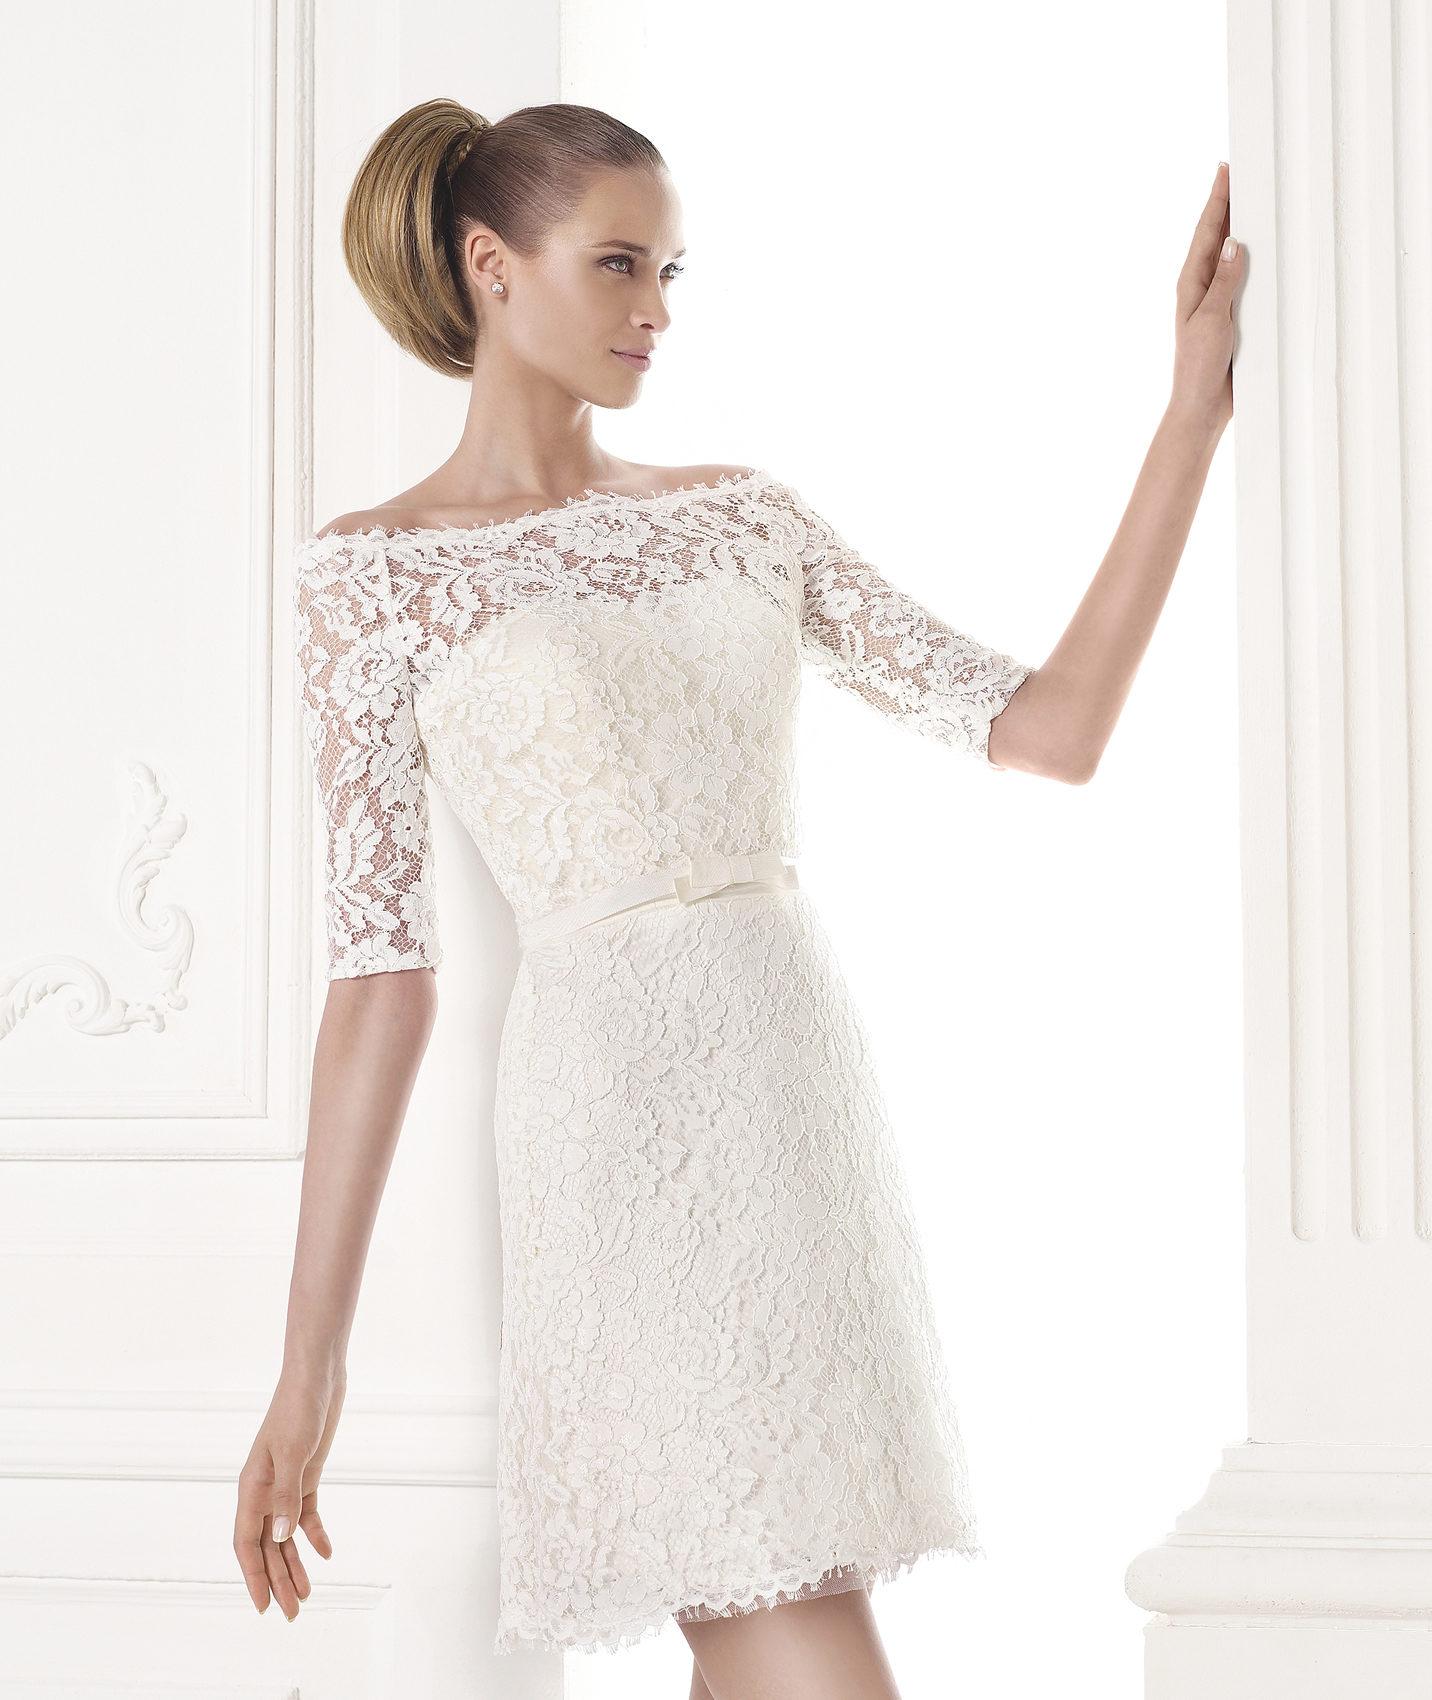 9883fa32efee0 Vestidos de novia cortos 2016 - esBelleza.com